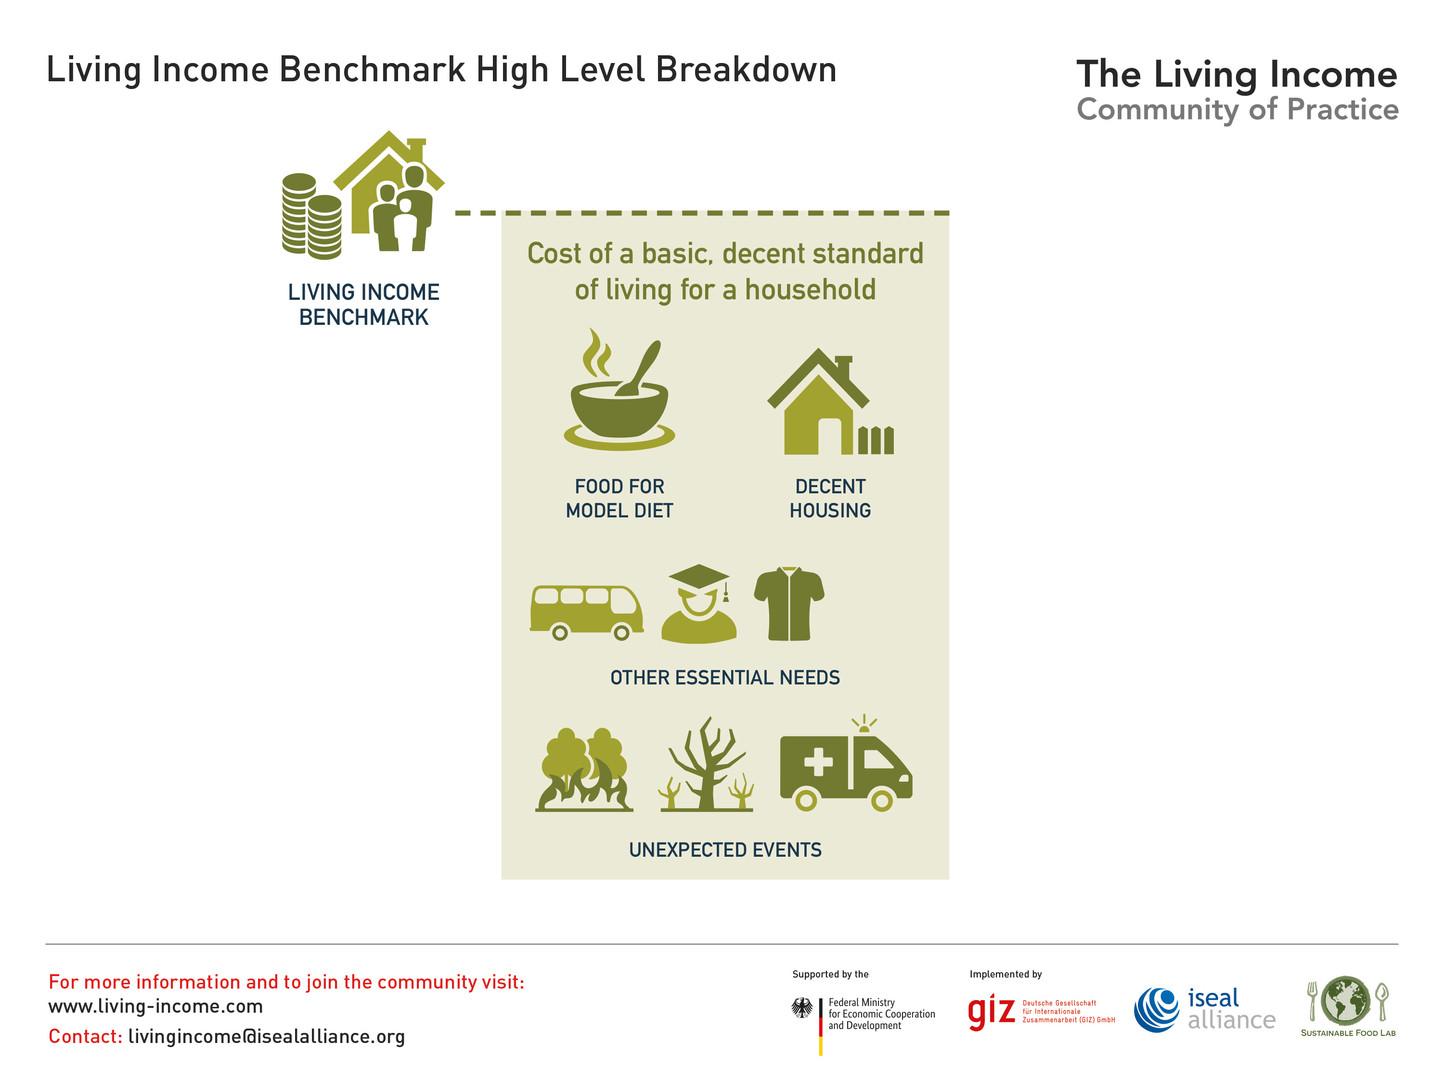 Living Income Benchmark High Level Breakdown - 2019 ©LivingIncomeCommunityofPractice